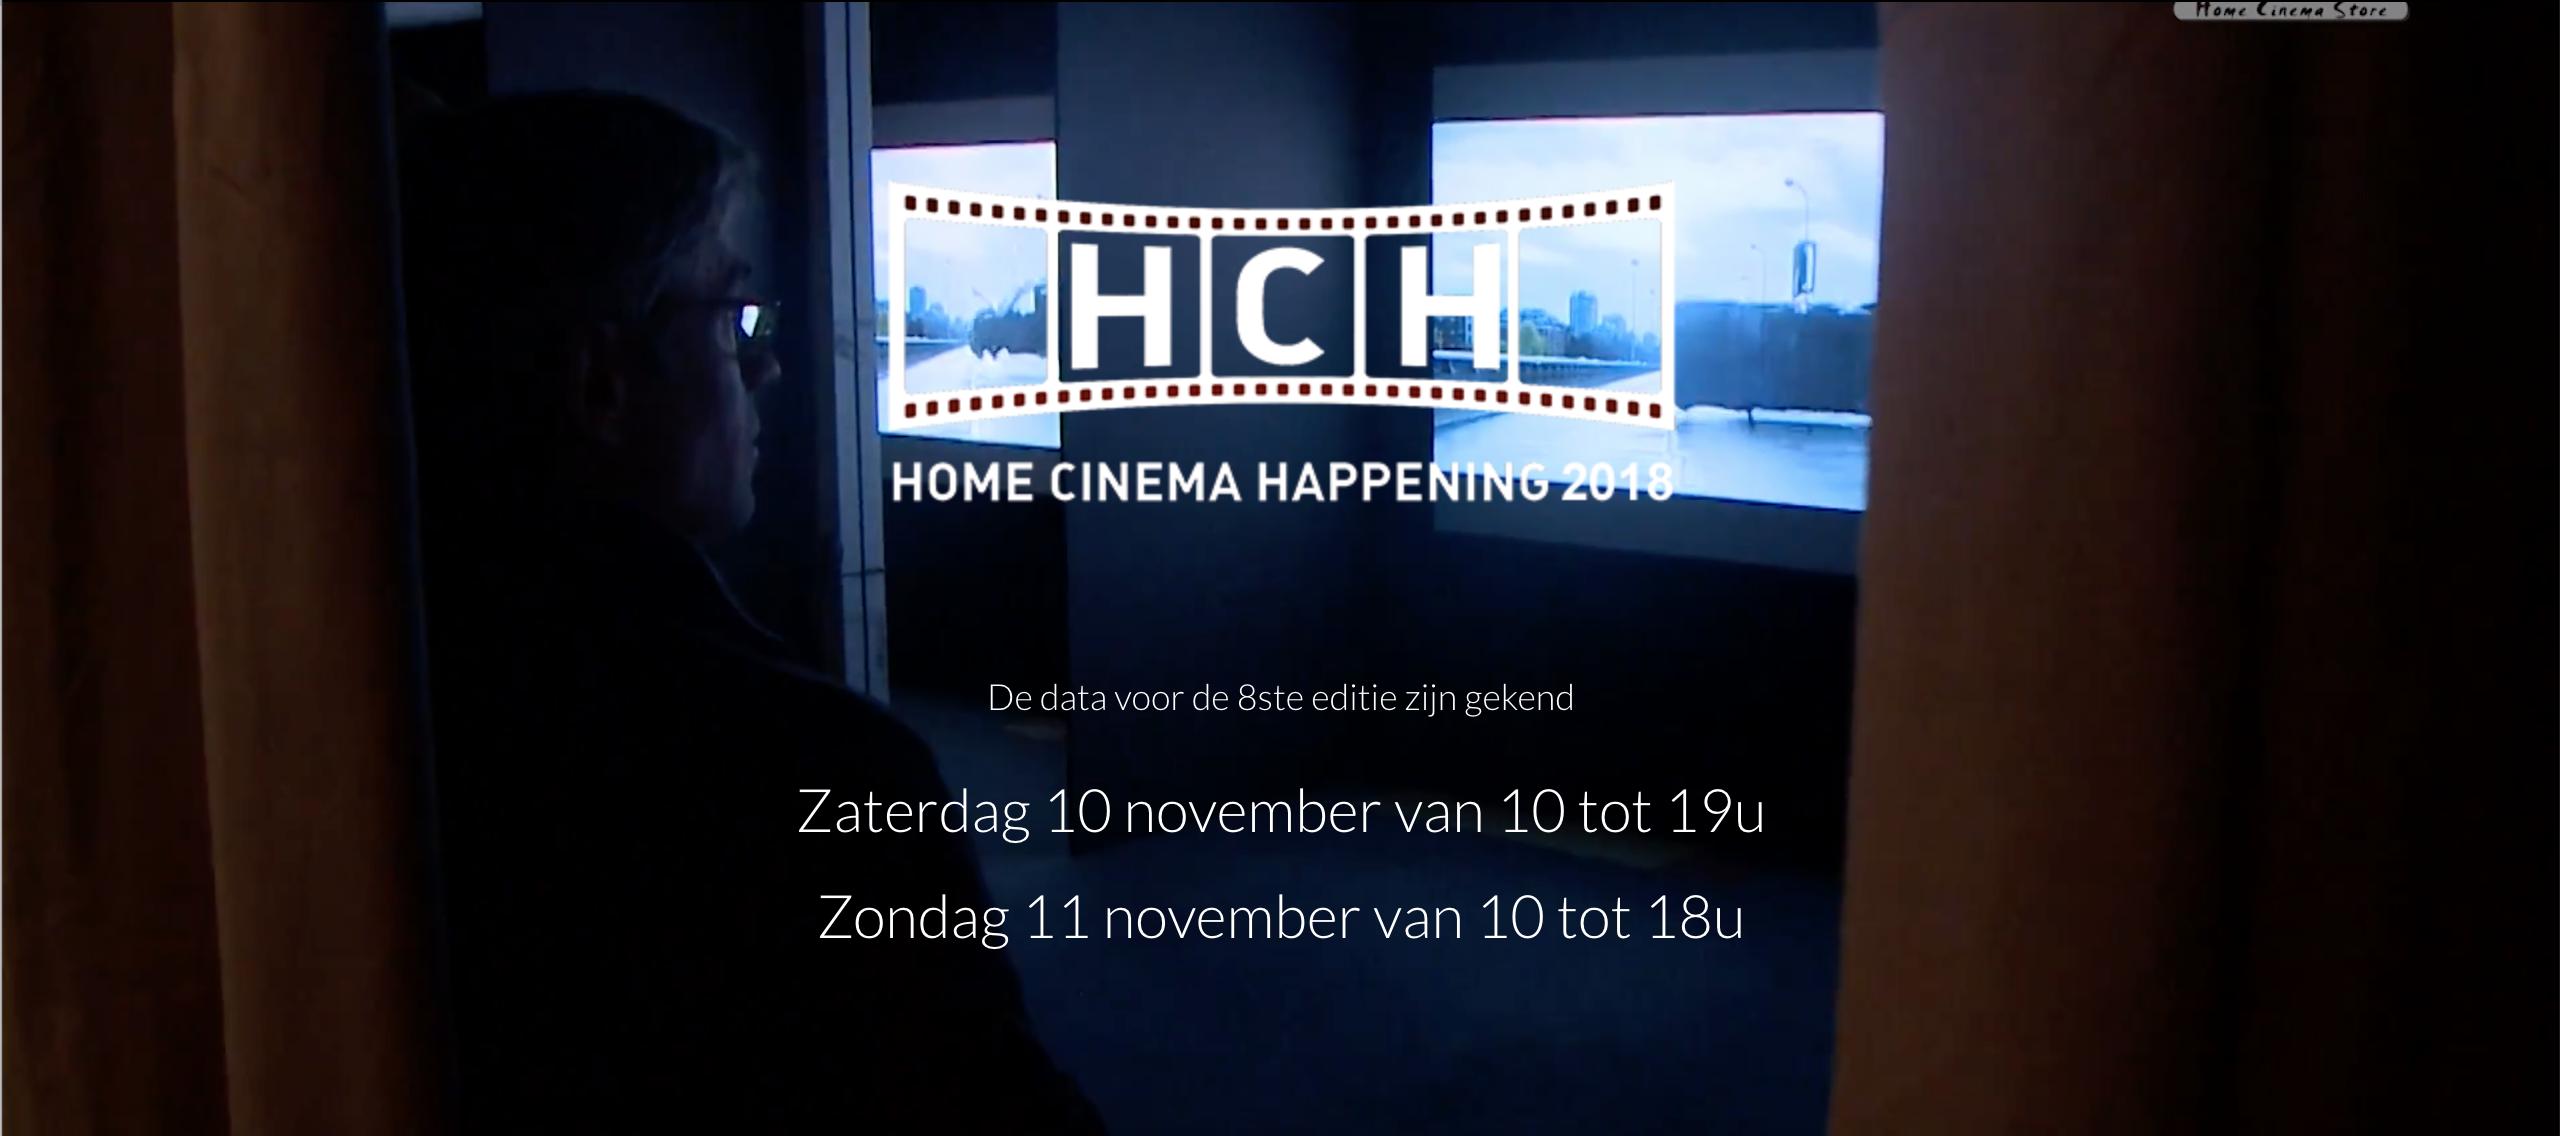 Home Cinema Happening 2018